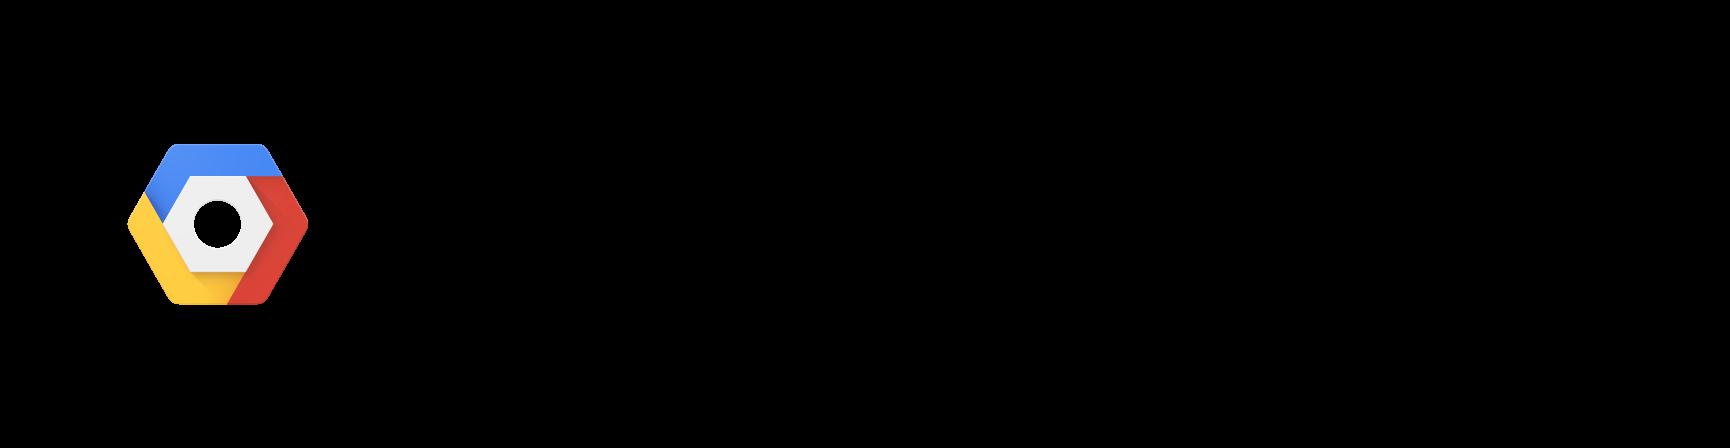 Amazon Web Services logo png Latinoamérica Office 365 eSource Capital